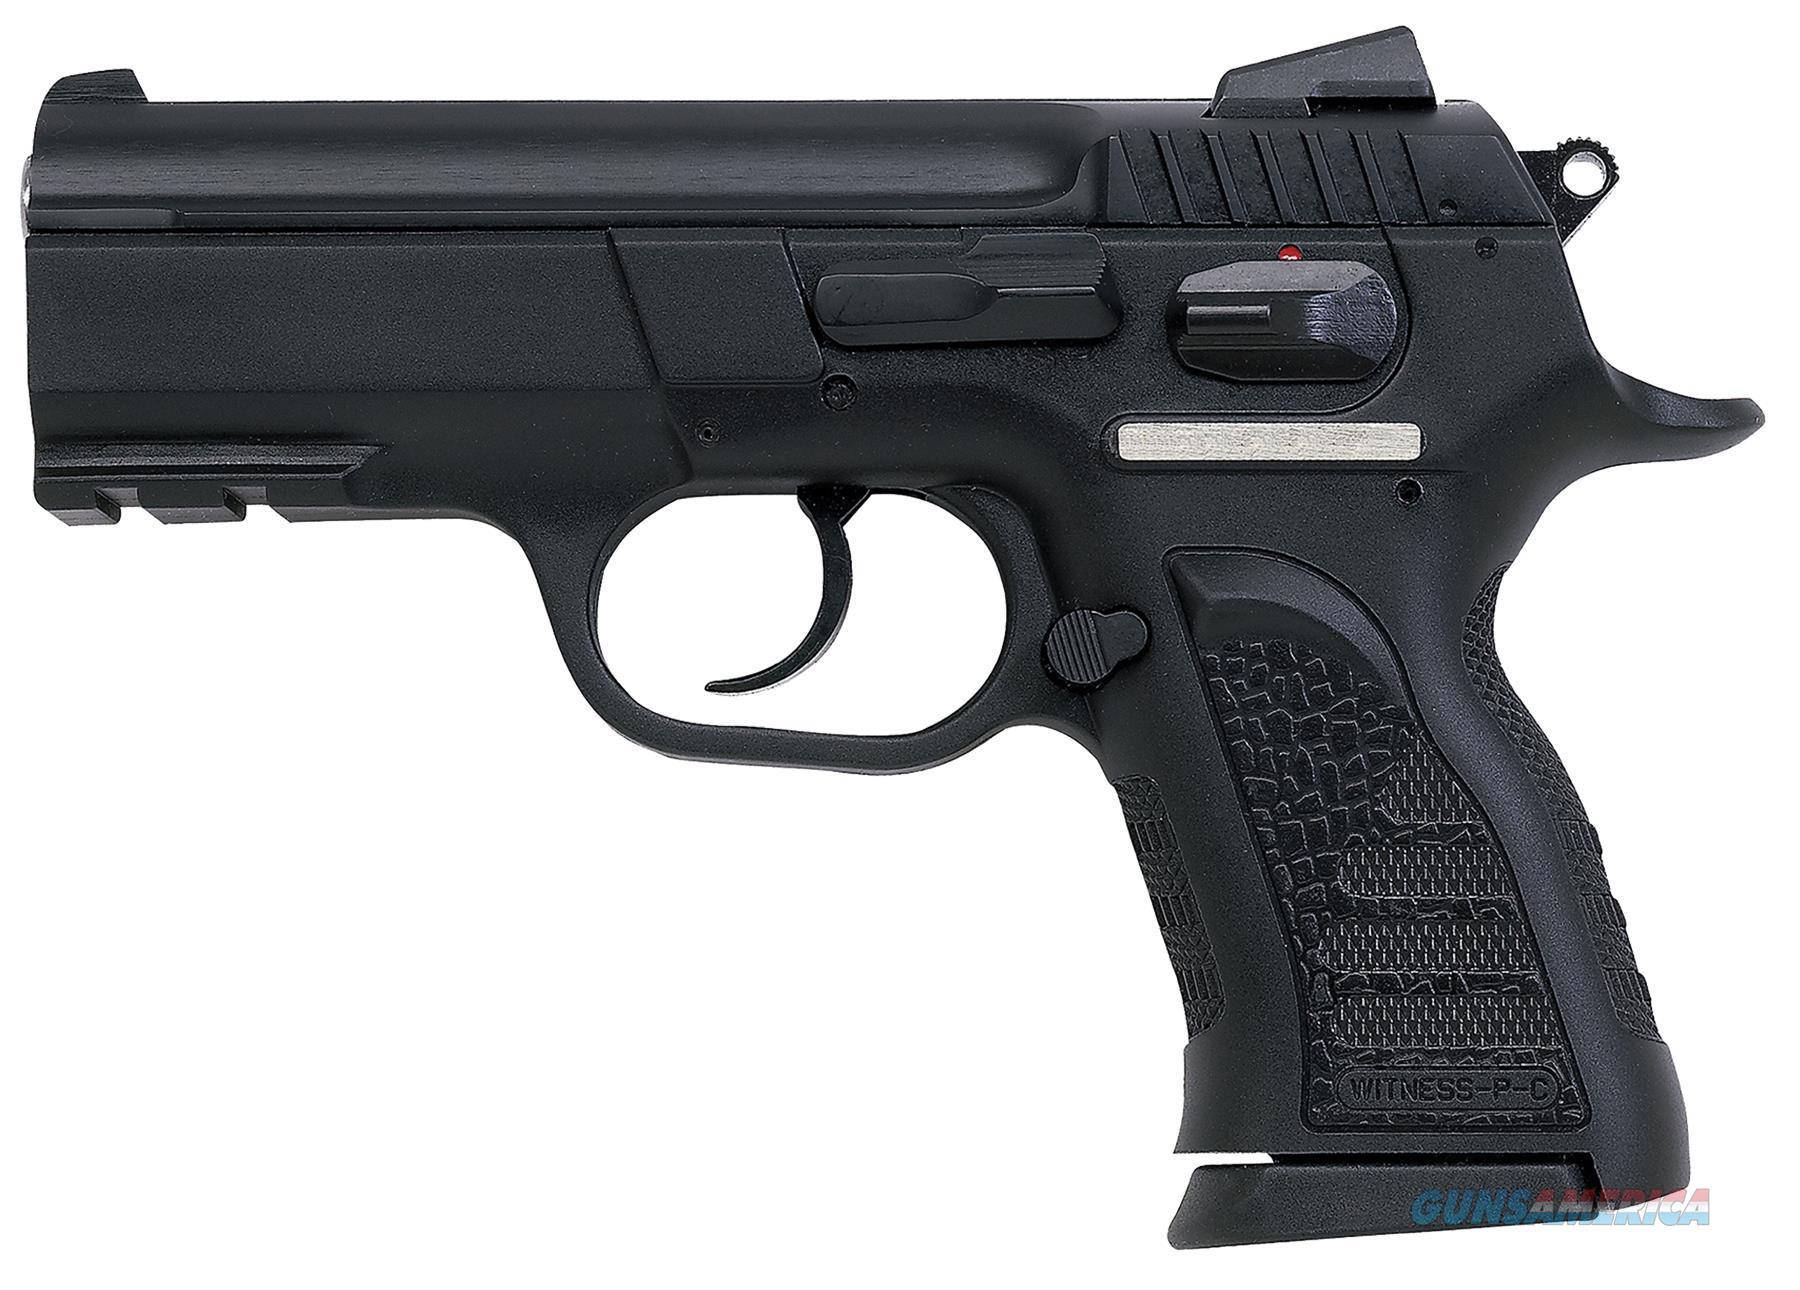 "Eaa 999108 Witness P Compact Sa/Da 40S&W 3.6"" 12+1 Poly Grip/Frame Blk 999108  Guns > Pistols > E Misc Pistols"